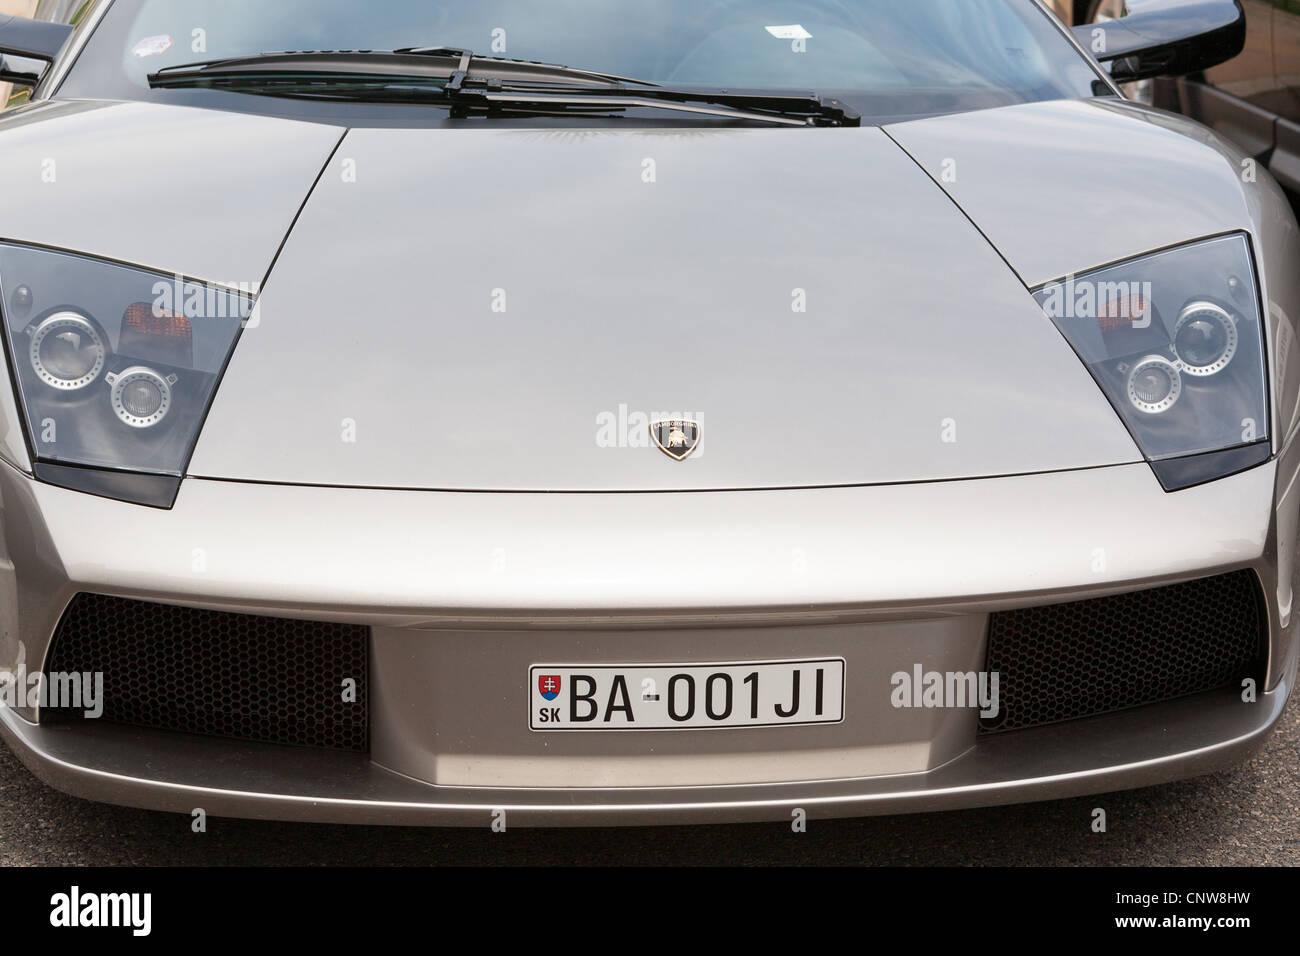 Lamborghini Car Montecarlo   Stock Image